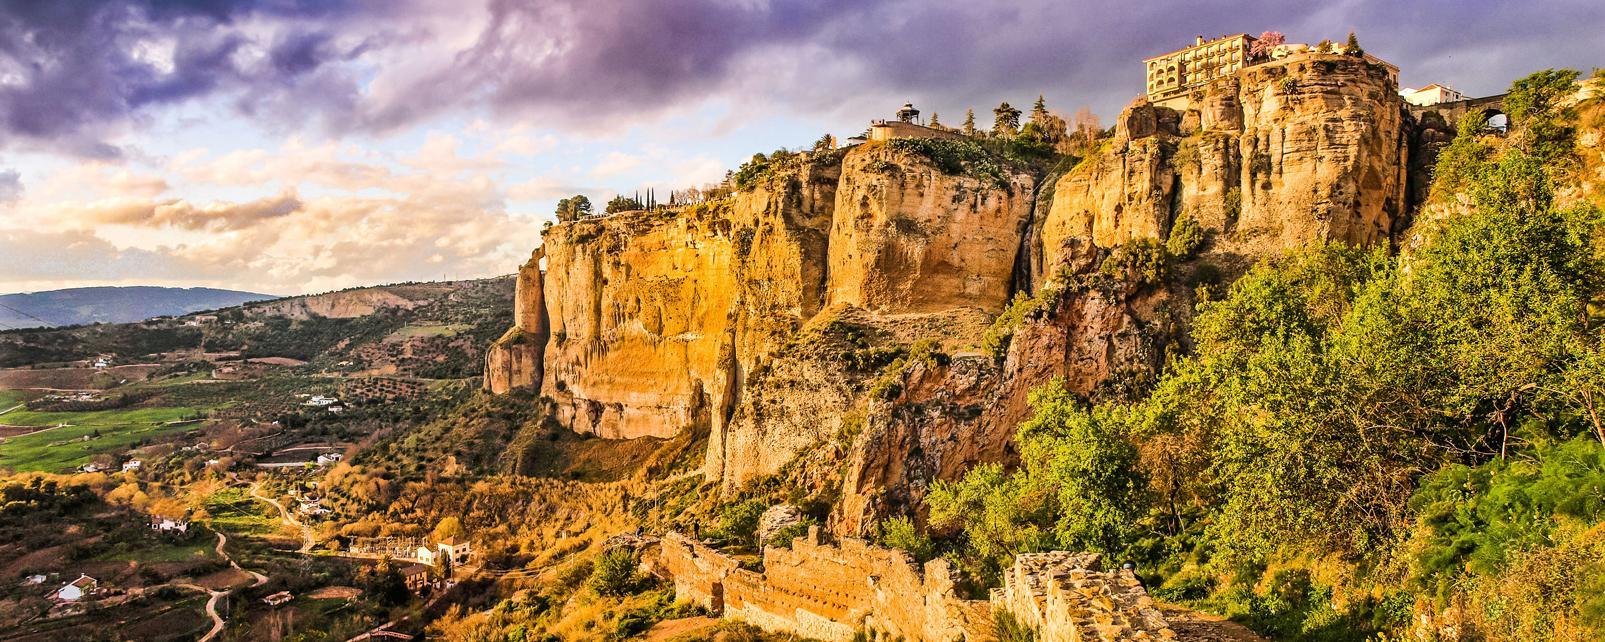 Andare a vivere in Andalusia